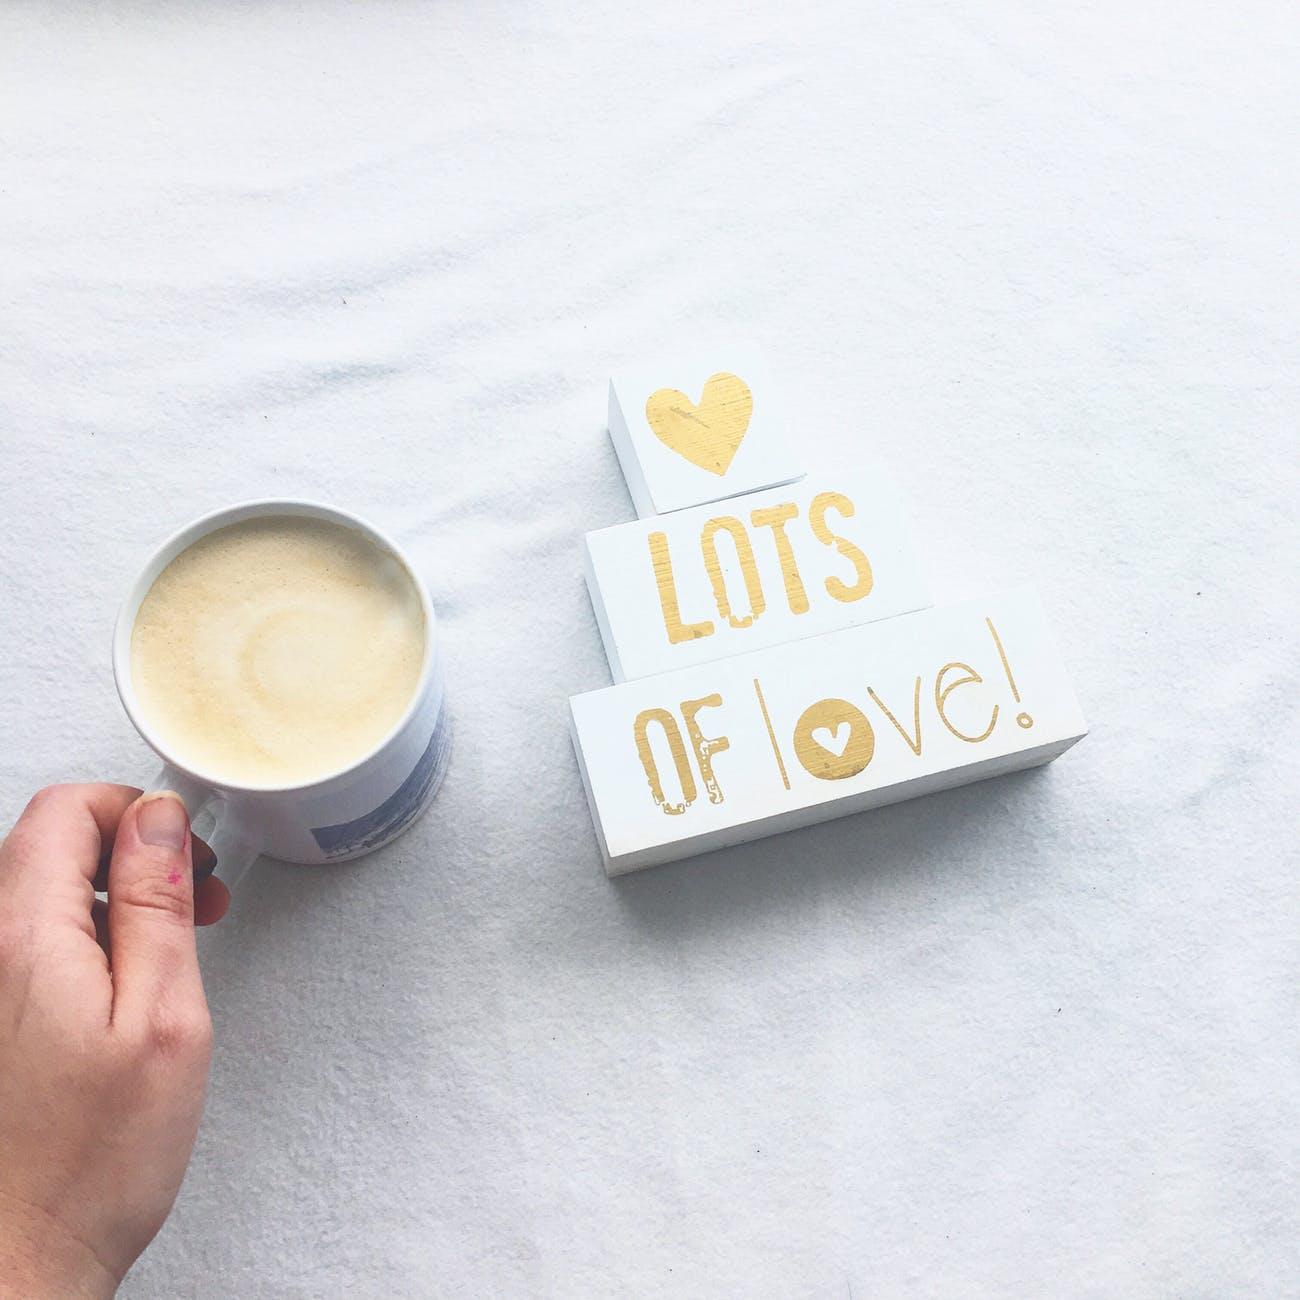 person holding white ceramic coffee mug